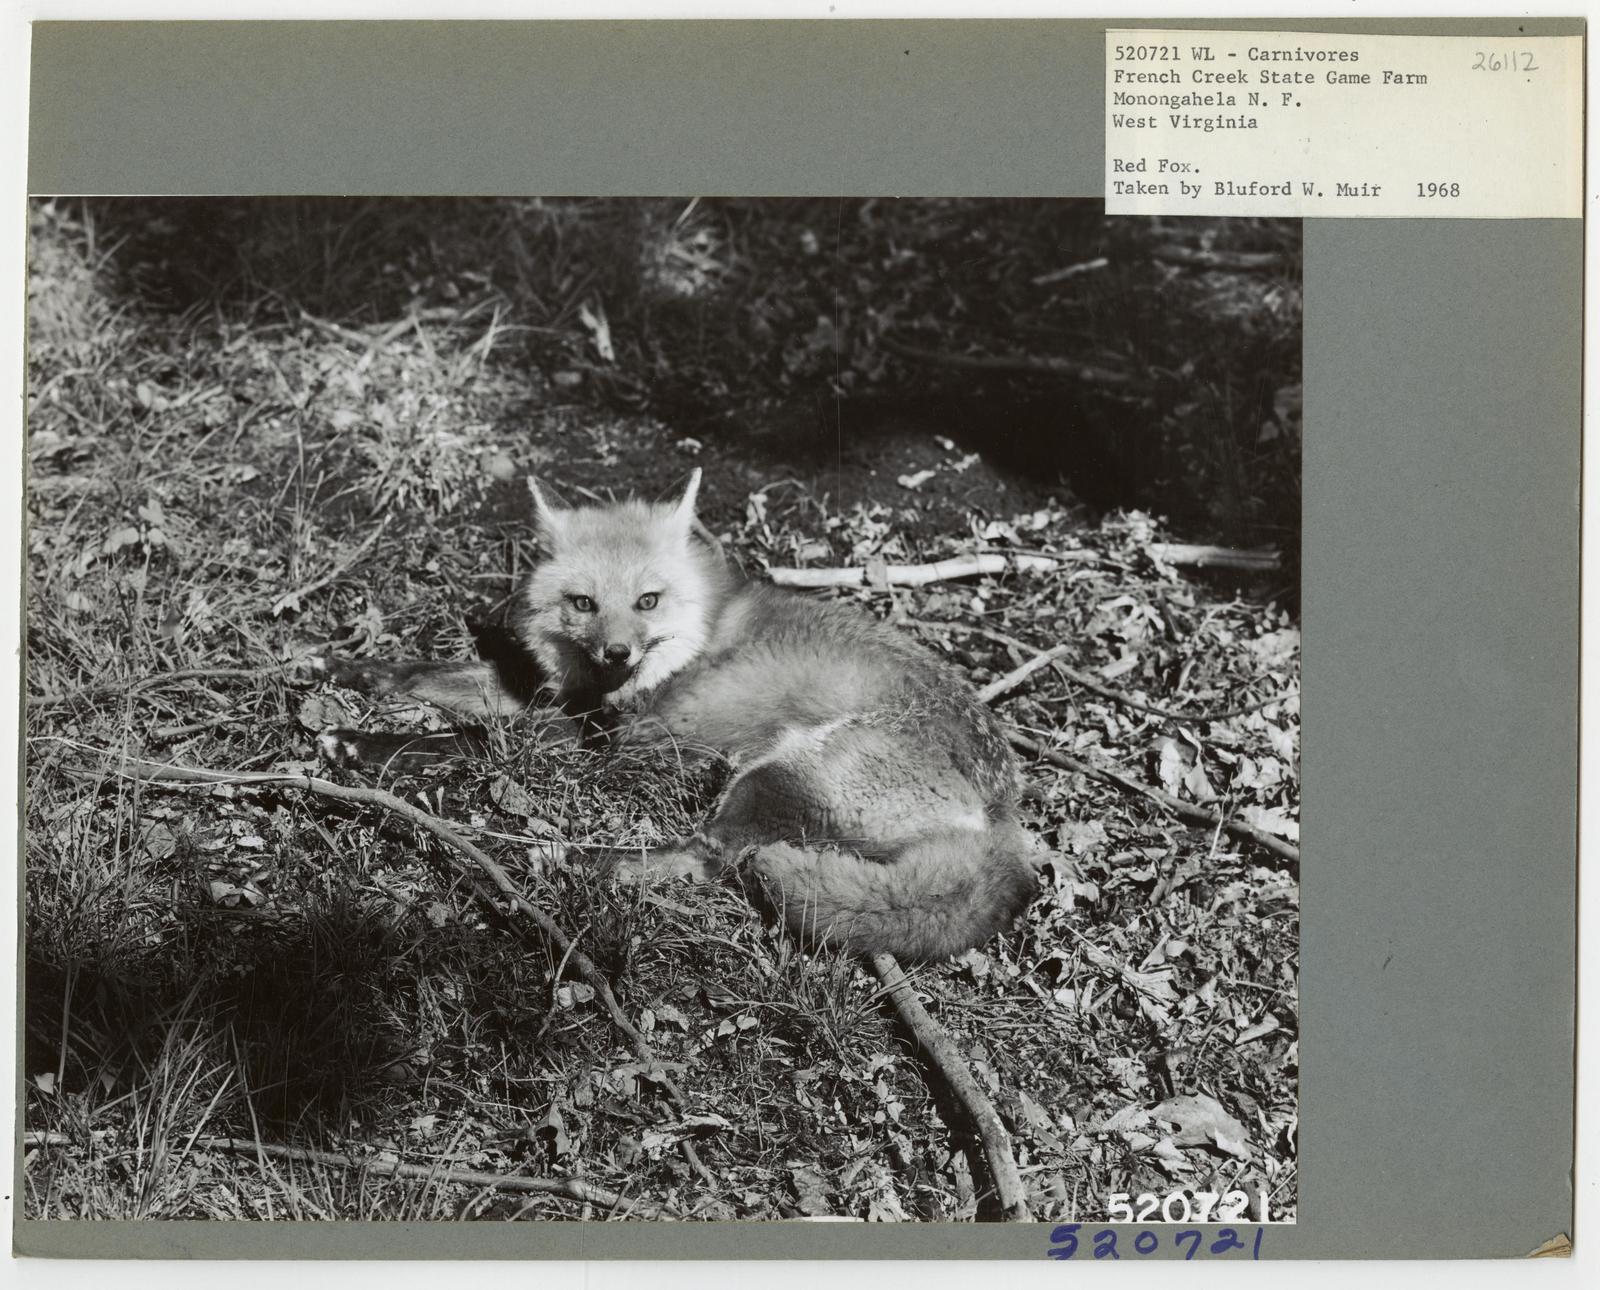 Animal: Fox - All States